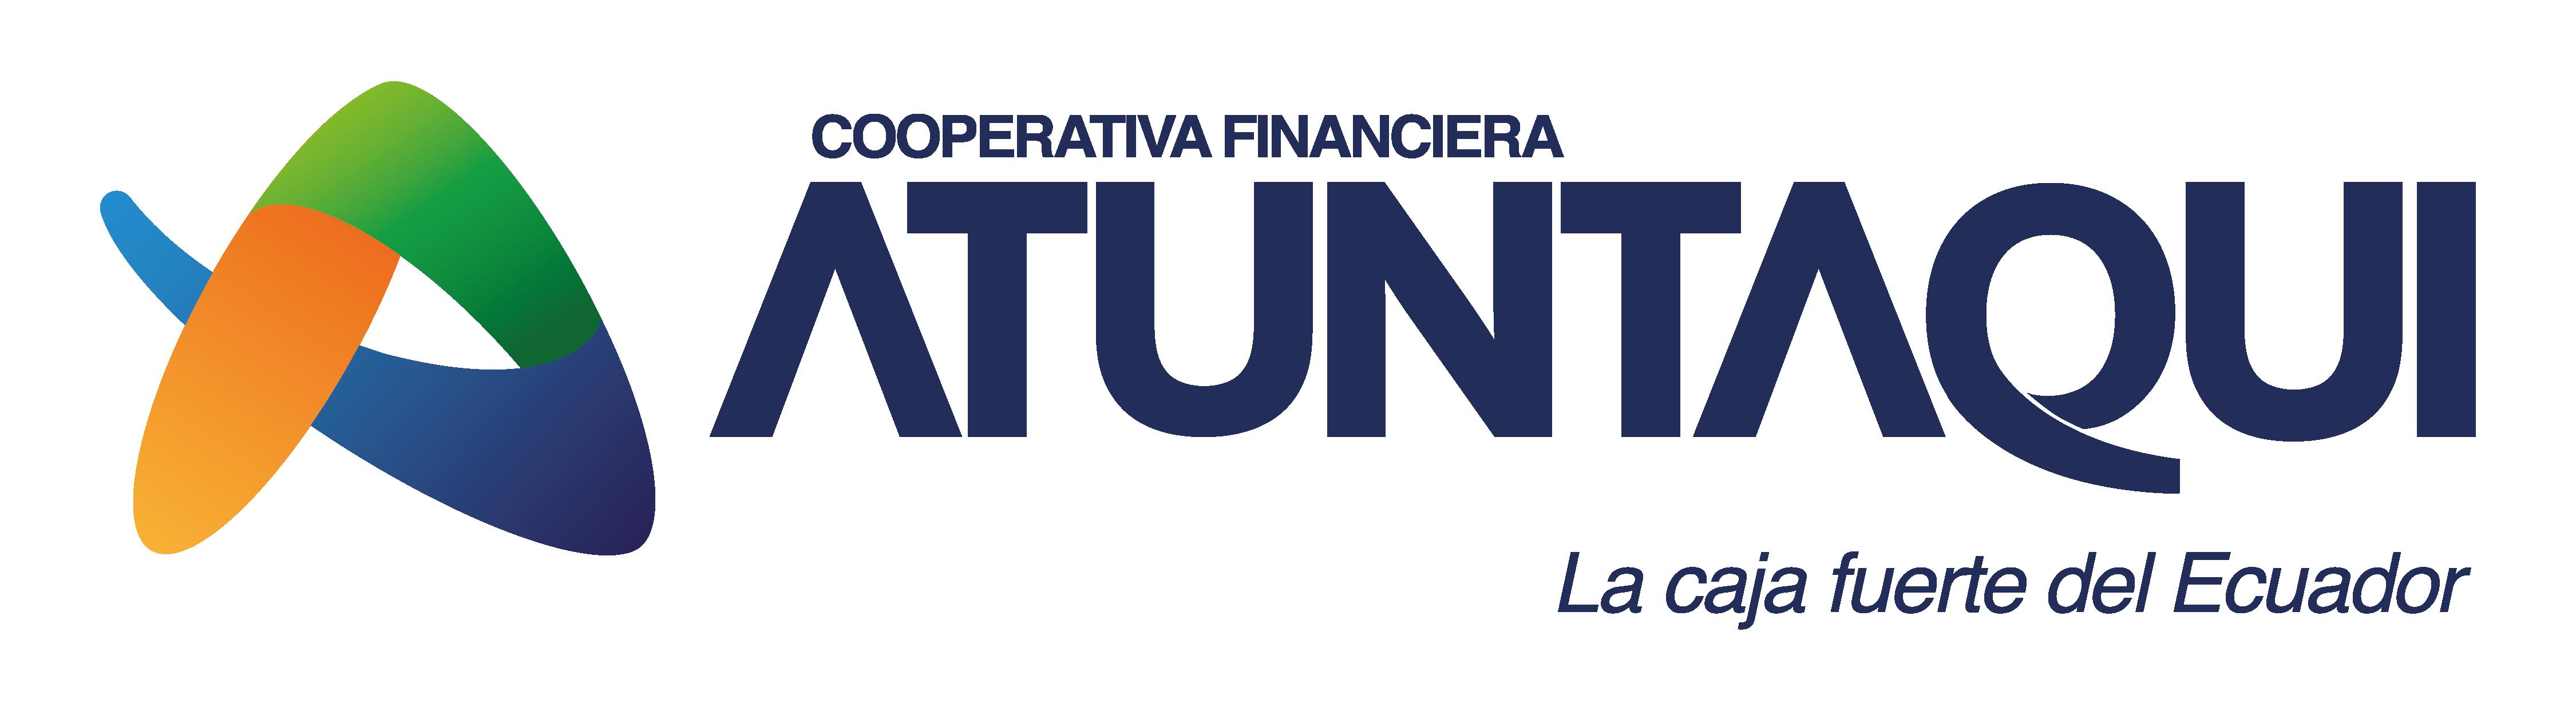 COOPERATIVA DE AHORRO Y CREDITO ATUNTAQUI LTDA